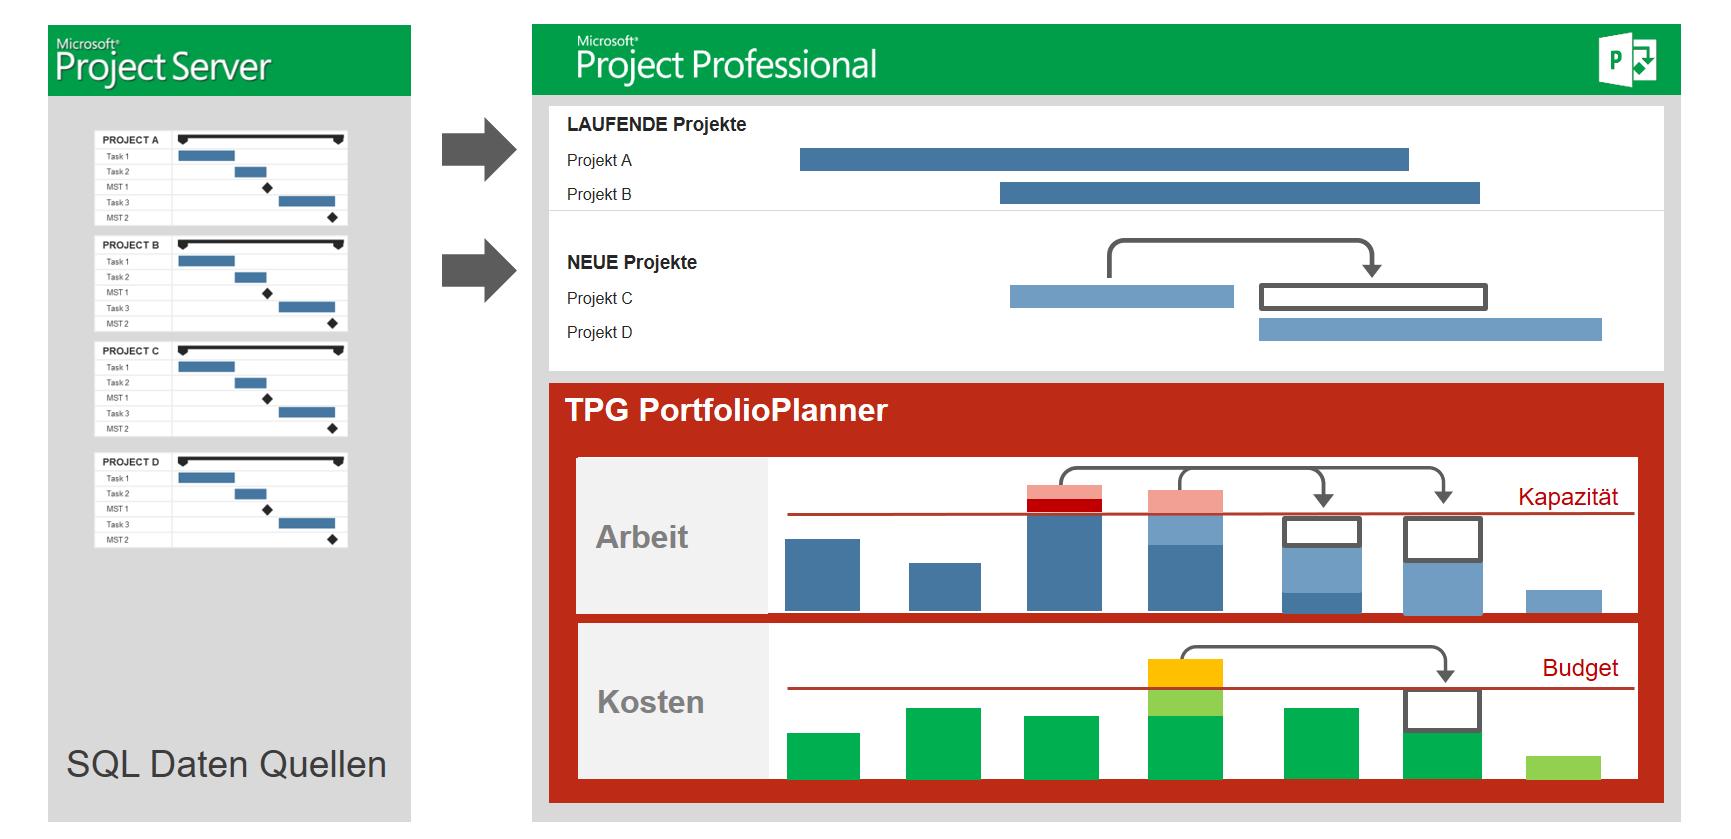 Schaubild: Projektportfolio-Überblick | Projektportfoliomanagement